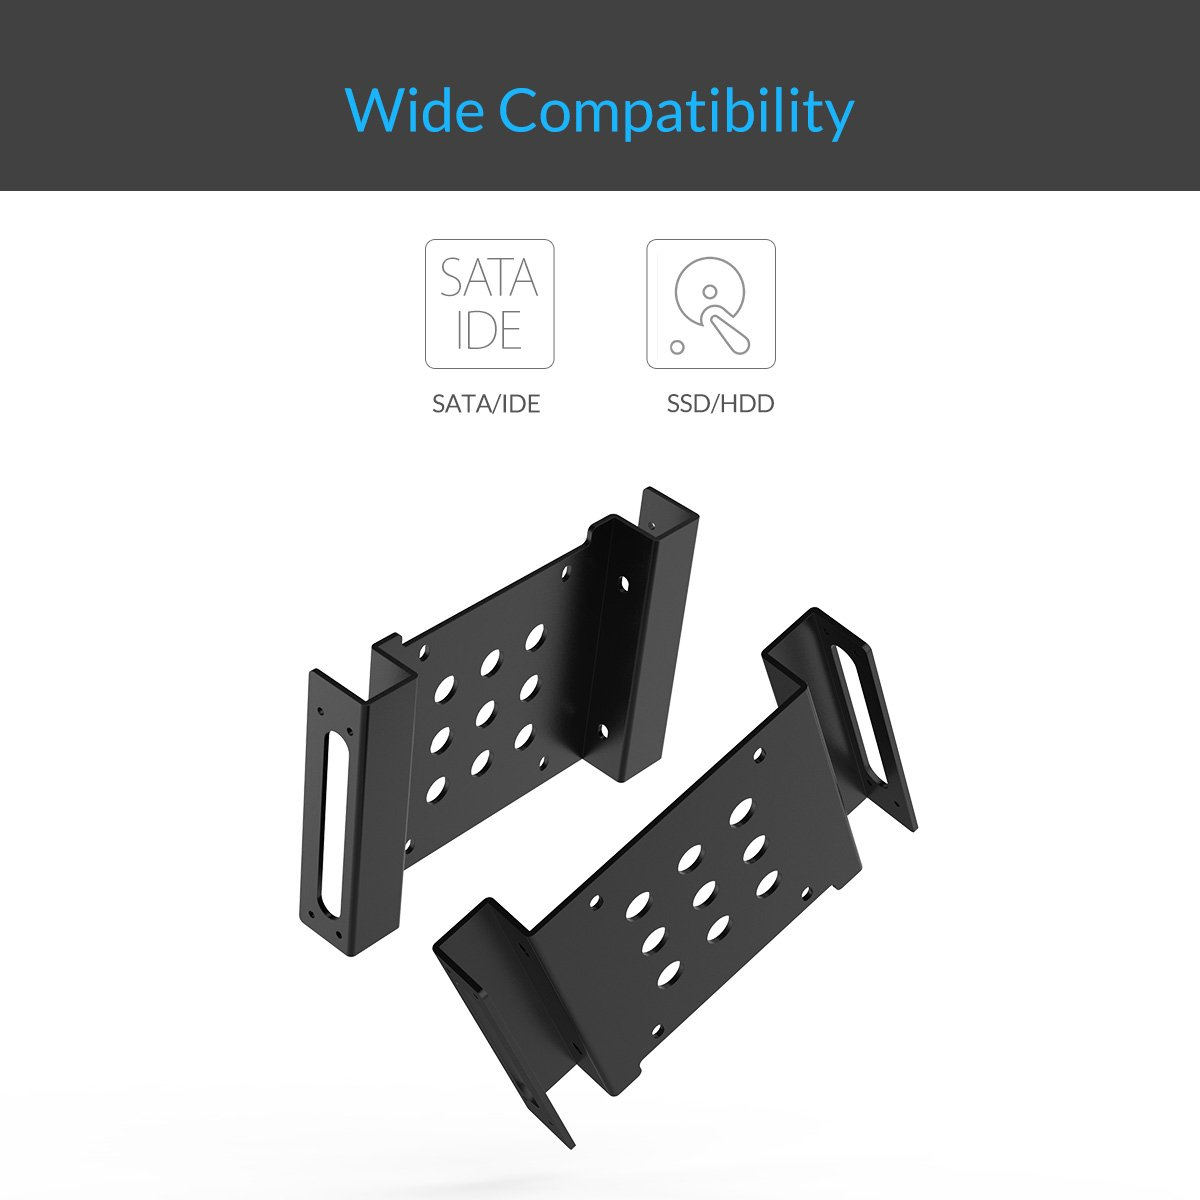 Amazon.com: ORICO AC325/ac52535/1125ss Series Soporte de ...